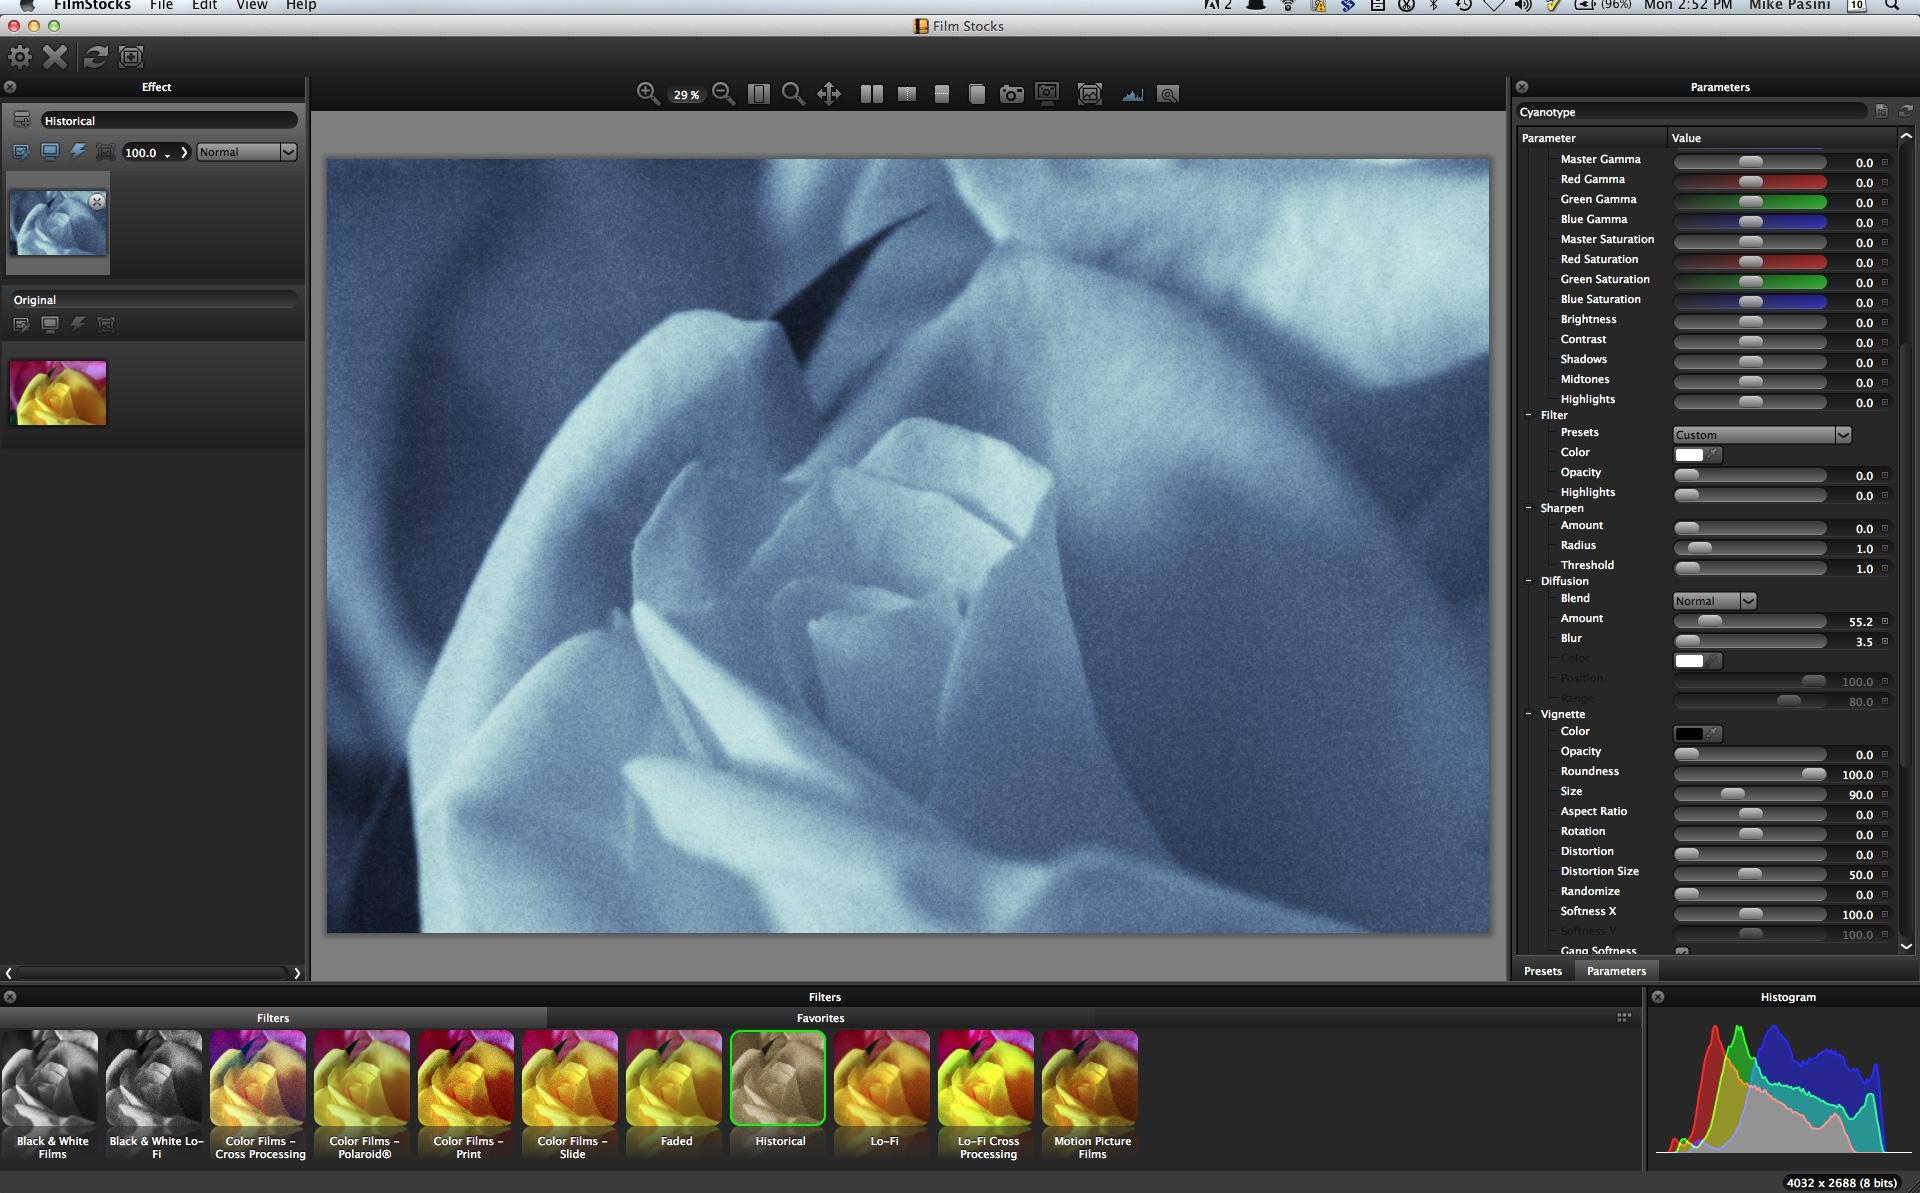 Digital Imaging Software Review: DFT Film Stocks